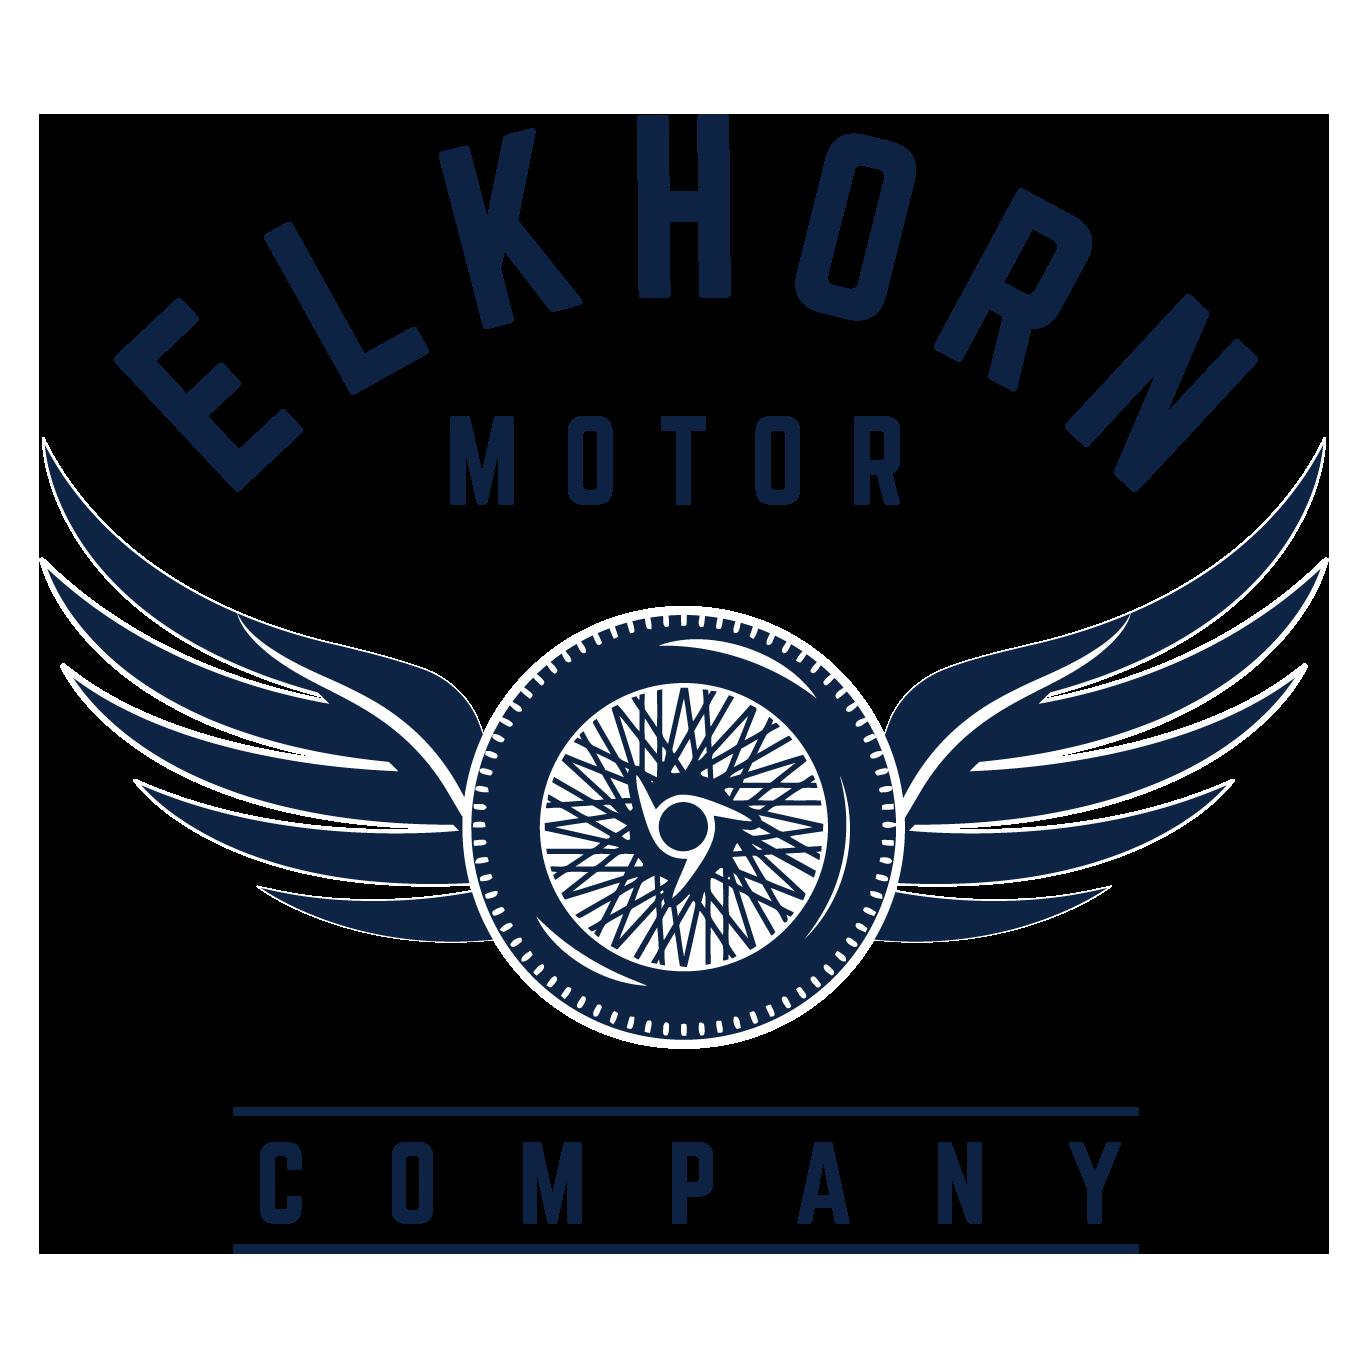 Elkhorn Motor Company